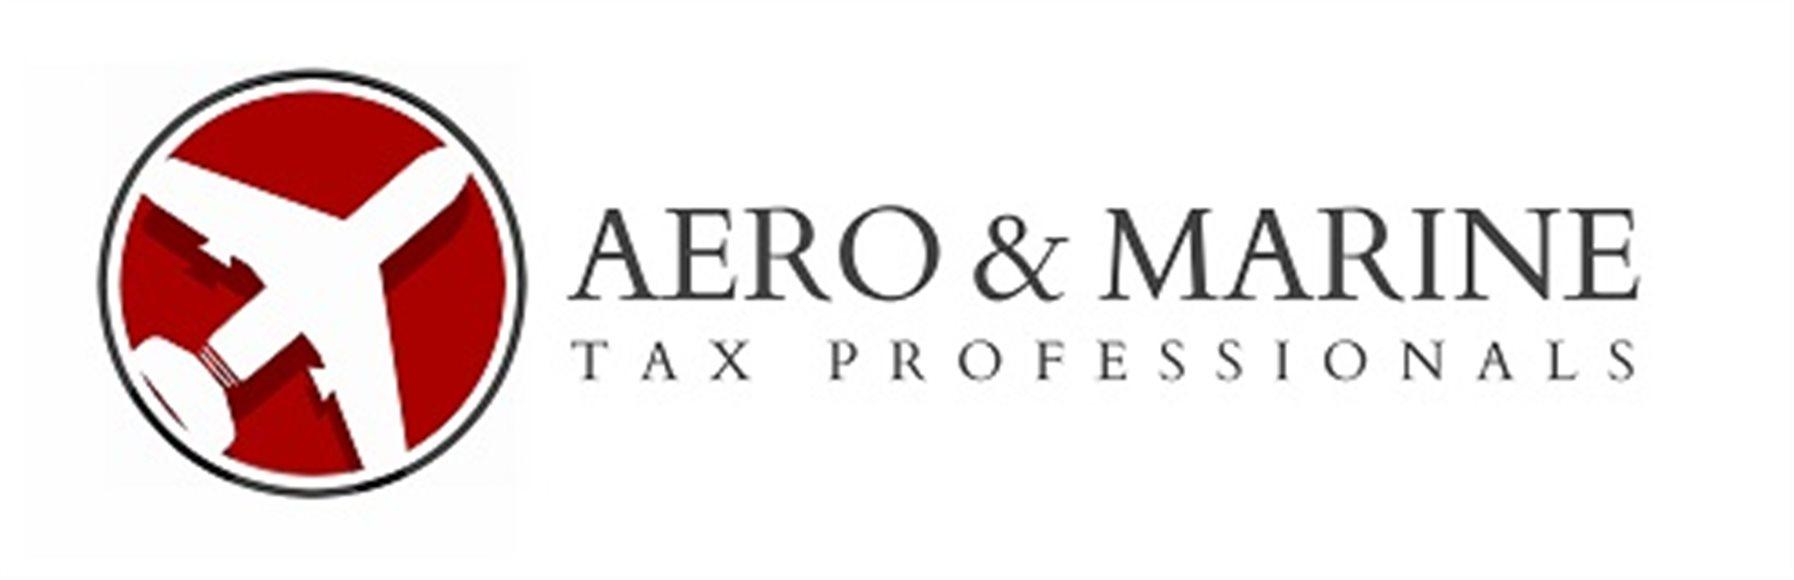 Aero Marine Tax Professionals